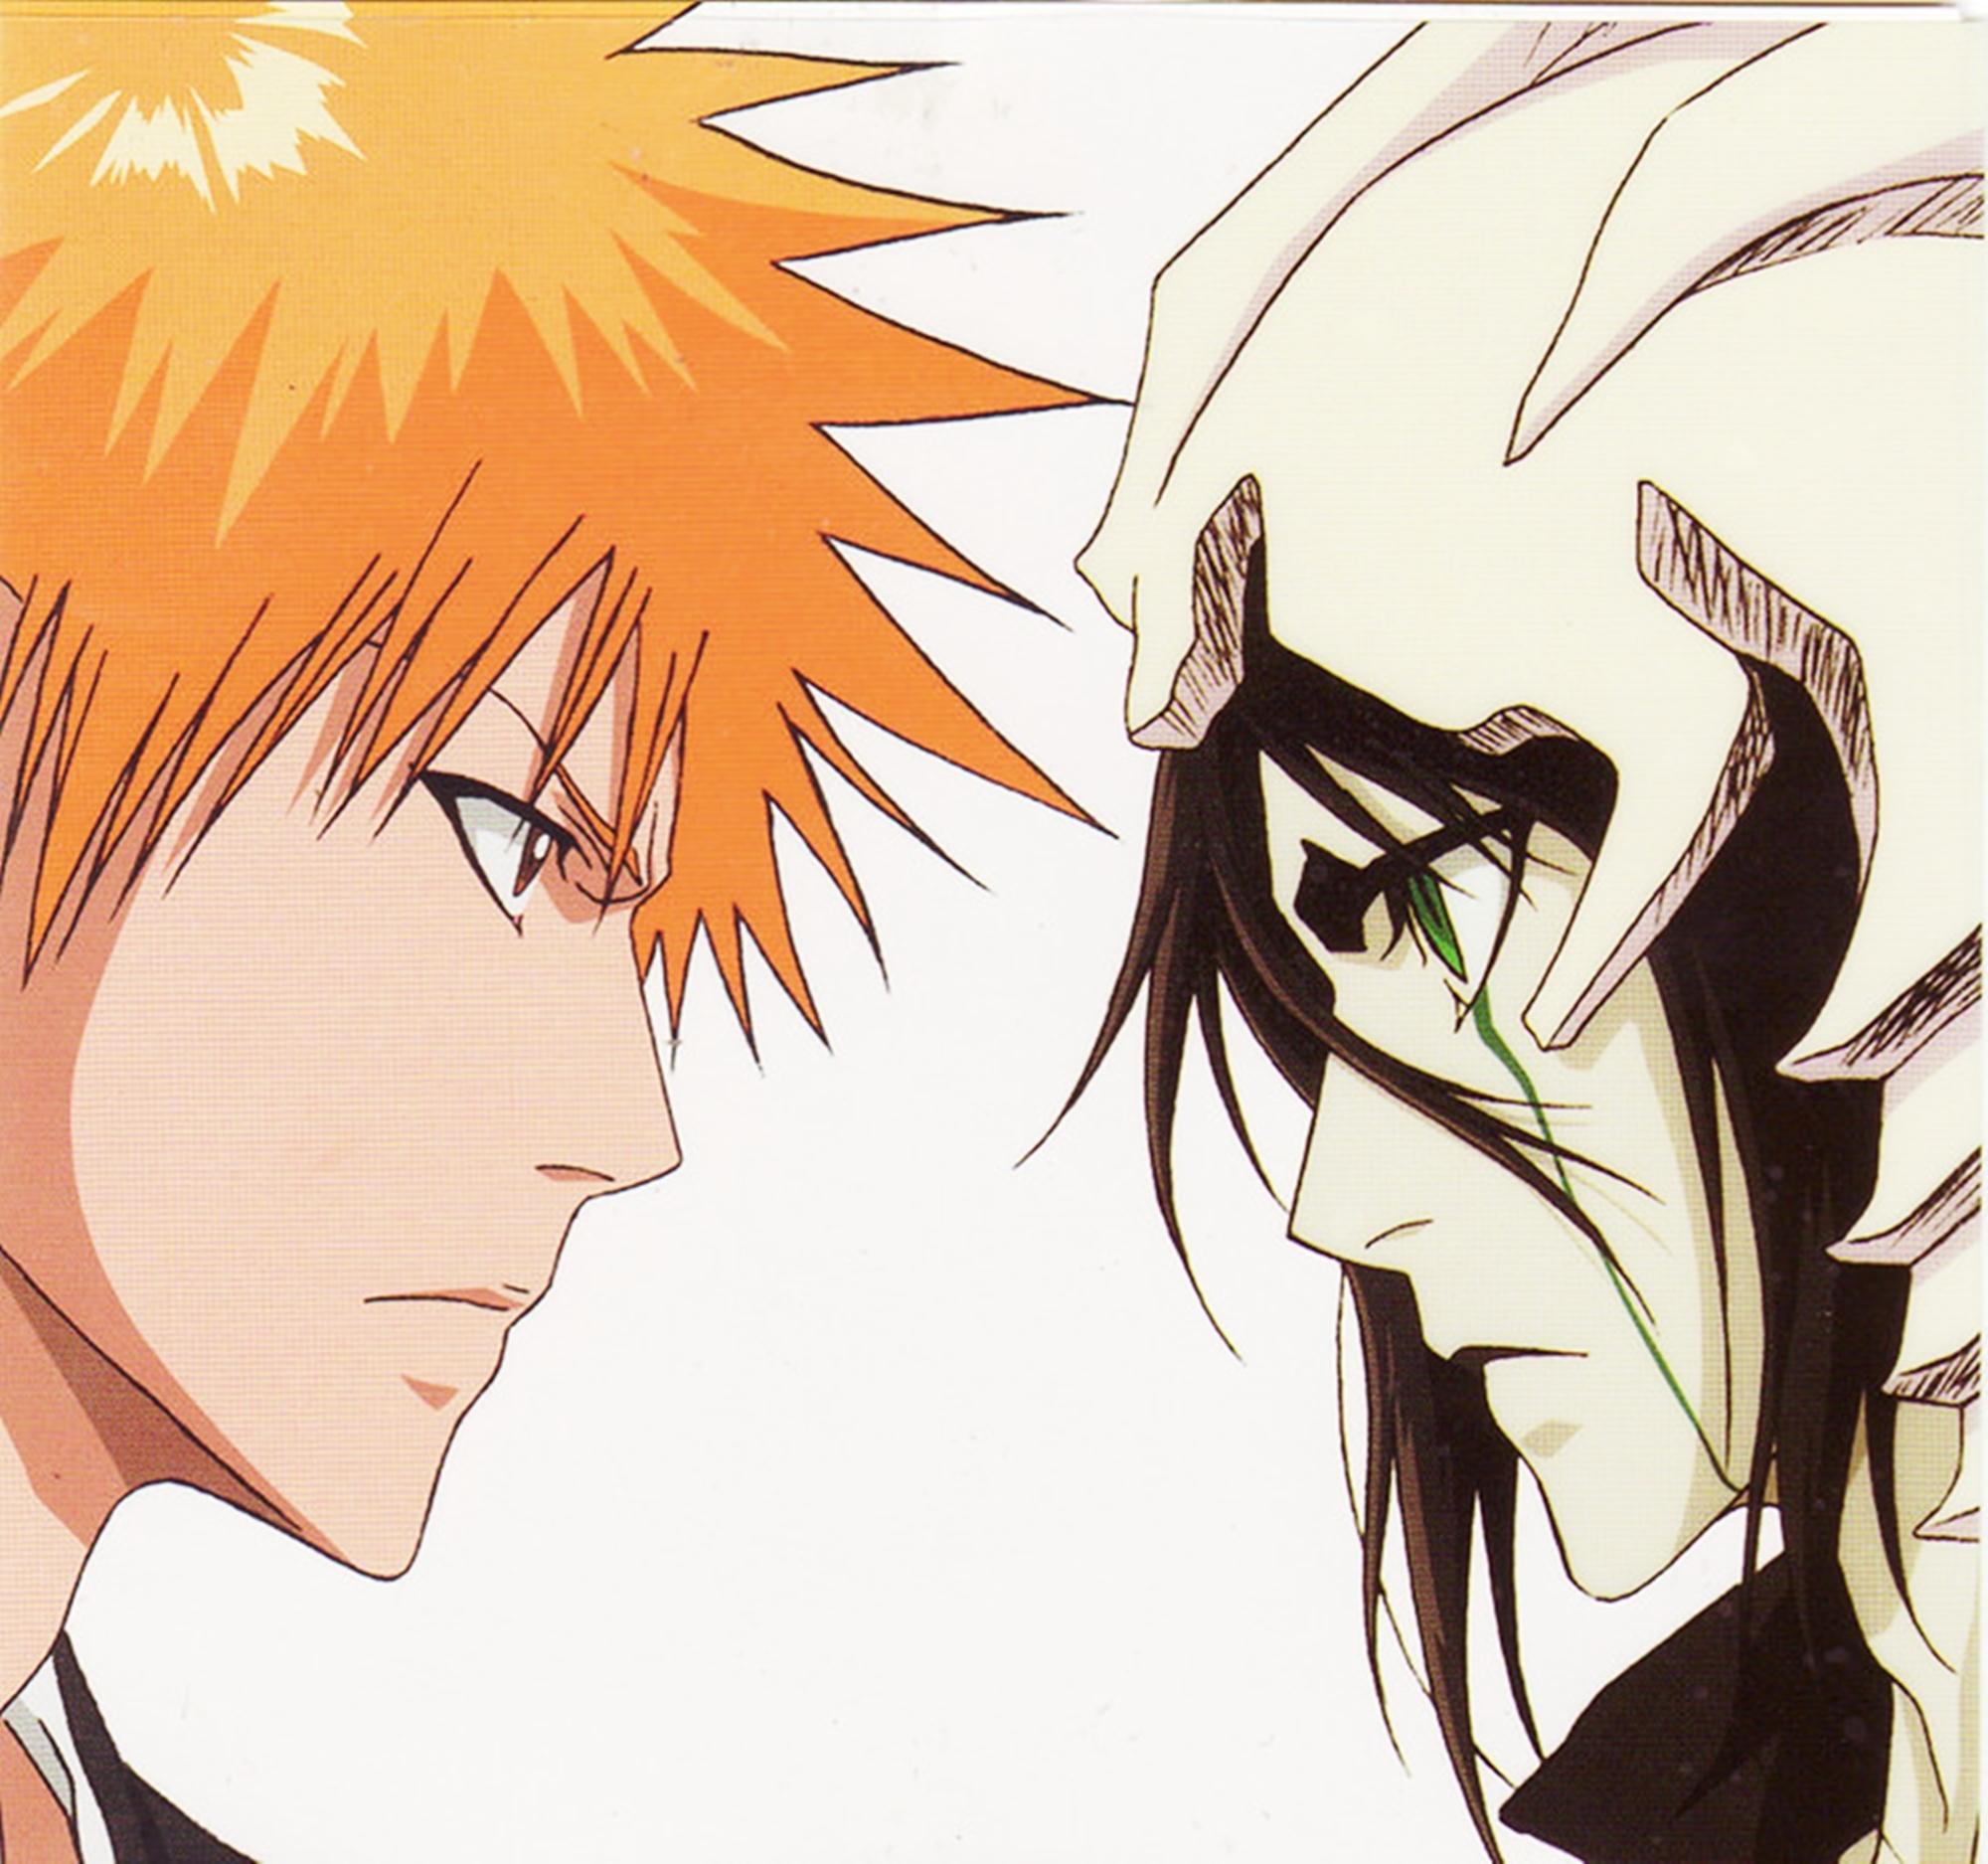 Ichigo and Ulquiorra